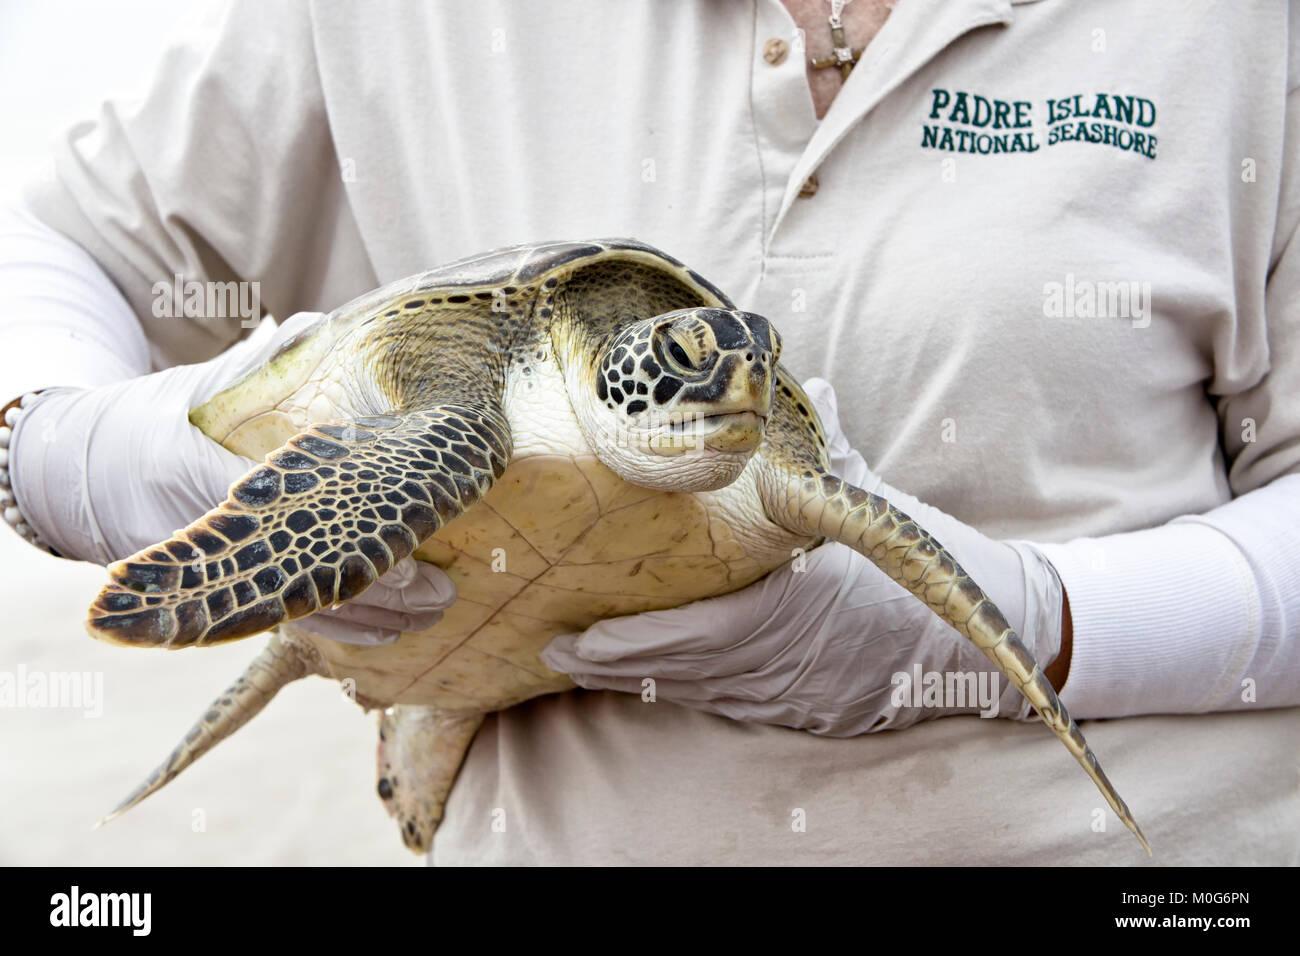 Female adult volunteer carrying & showing rehabilitated Kemp's Ridley Sea Turtle 'Lepidochelys kempii' - Stock Image